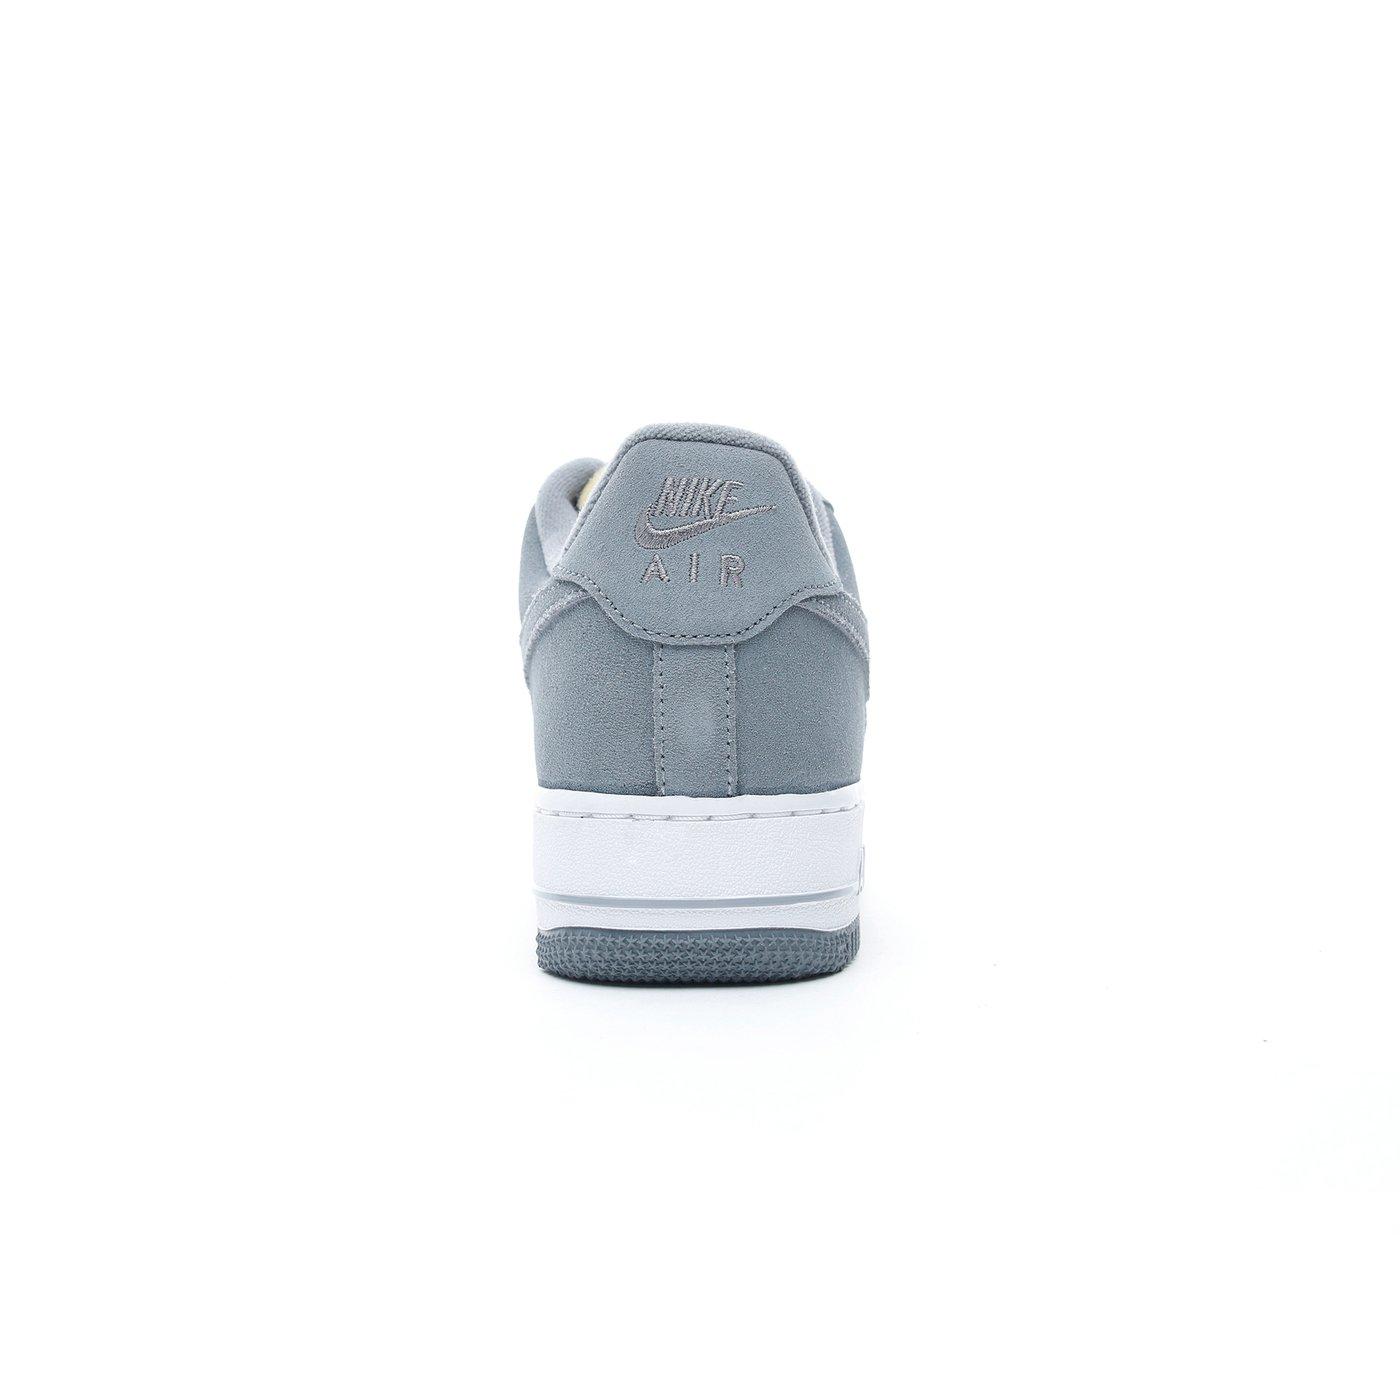 Nike Air Force 1 '07 Lv8 Gri Erkek Spor Ayakkabı